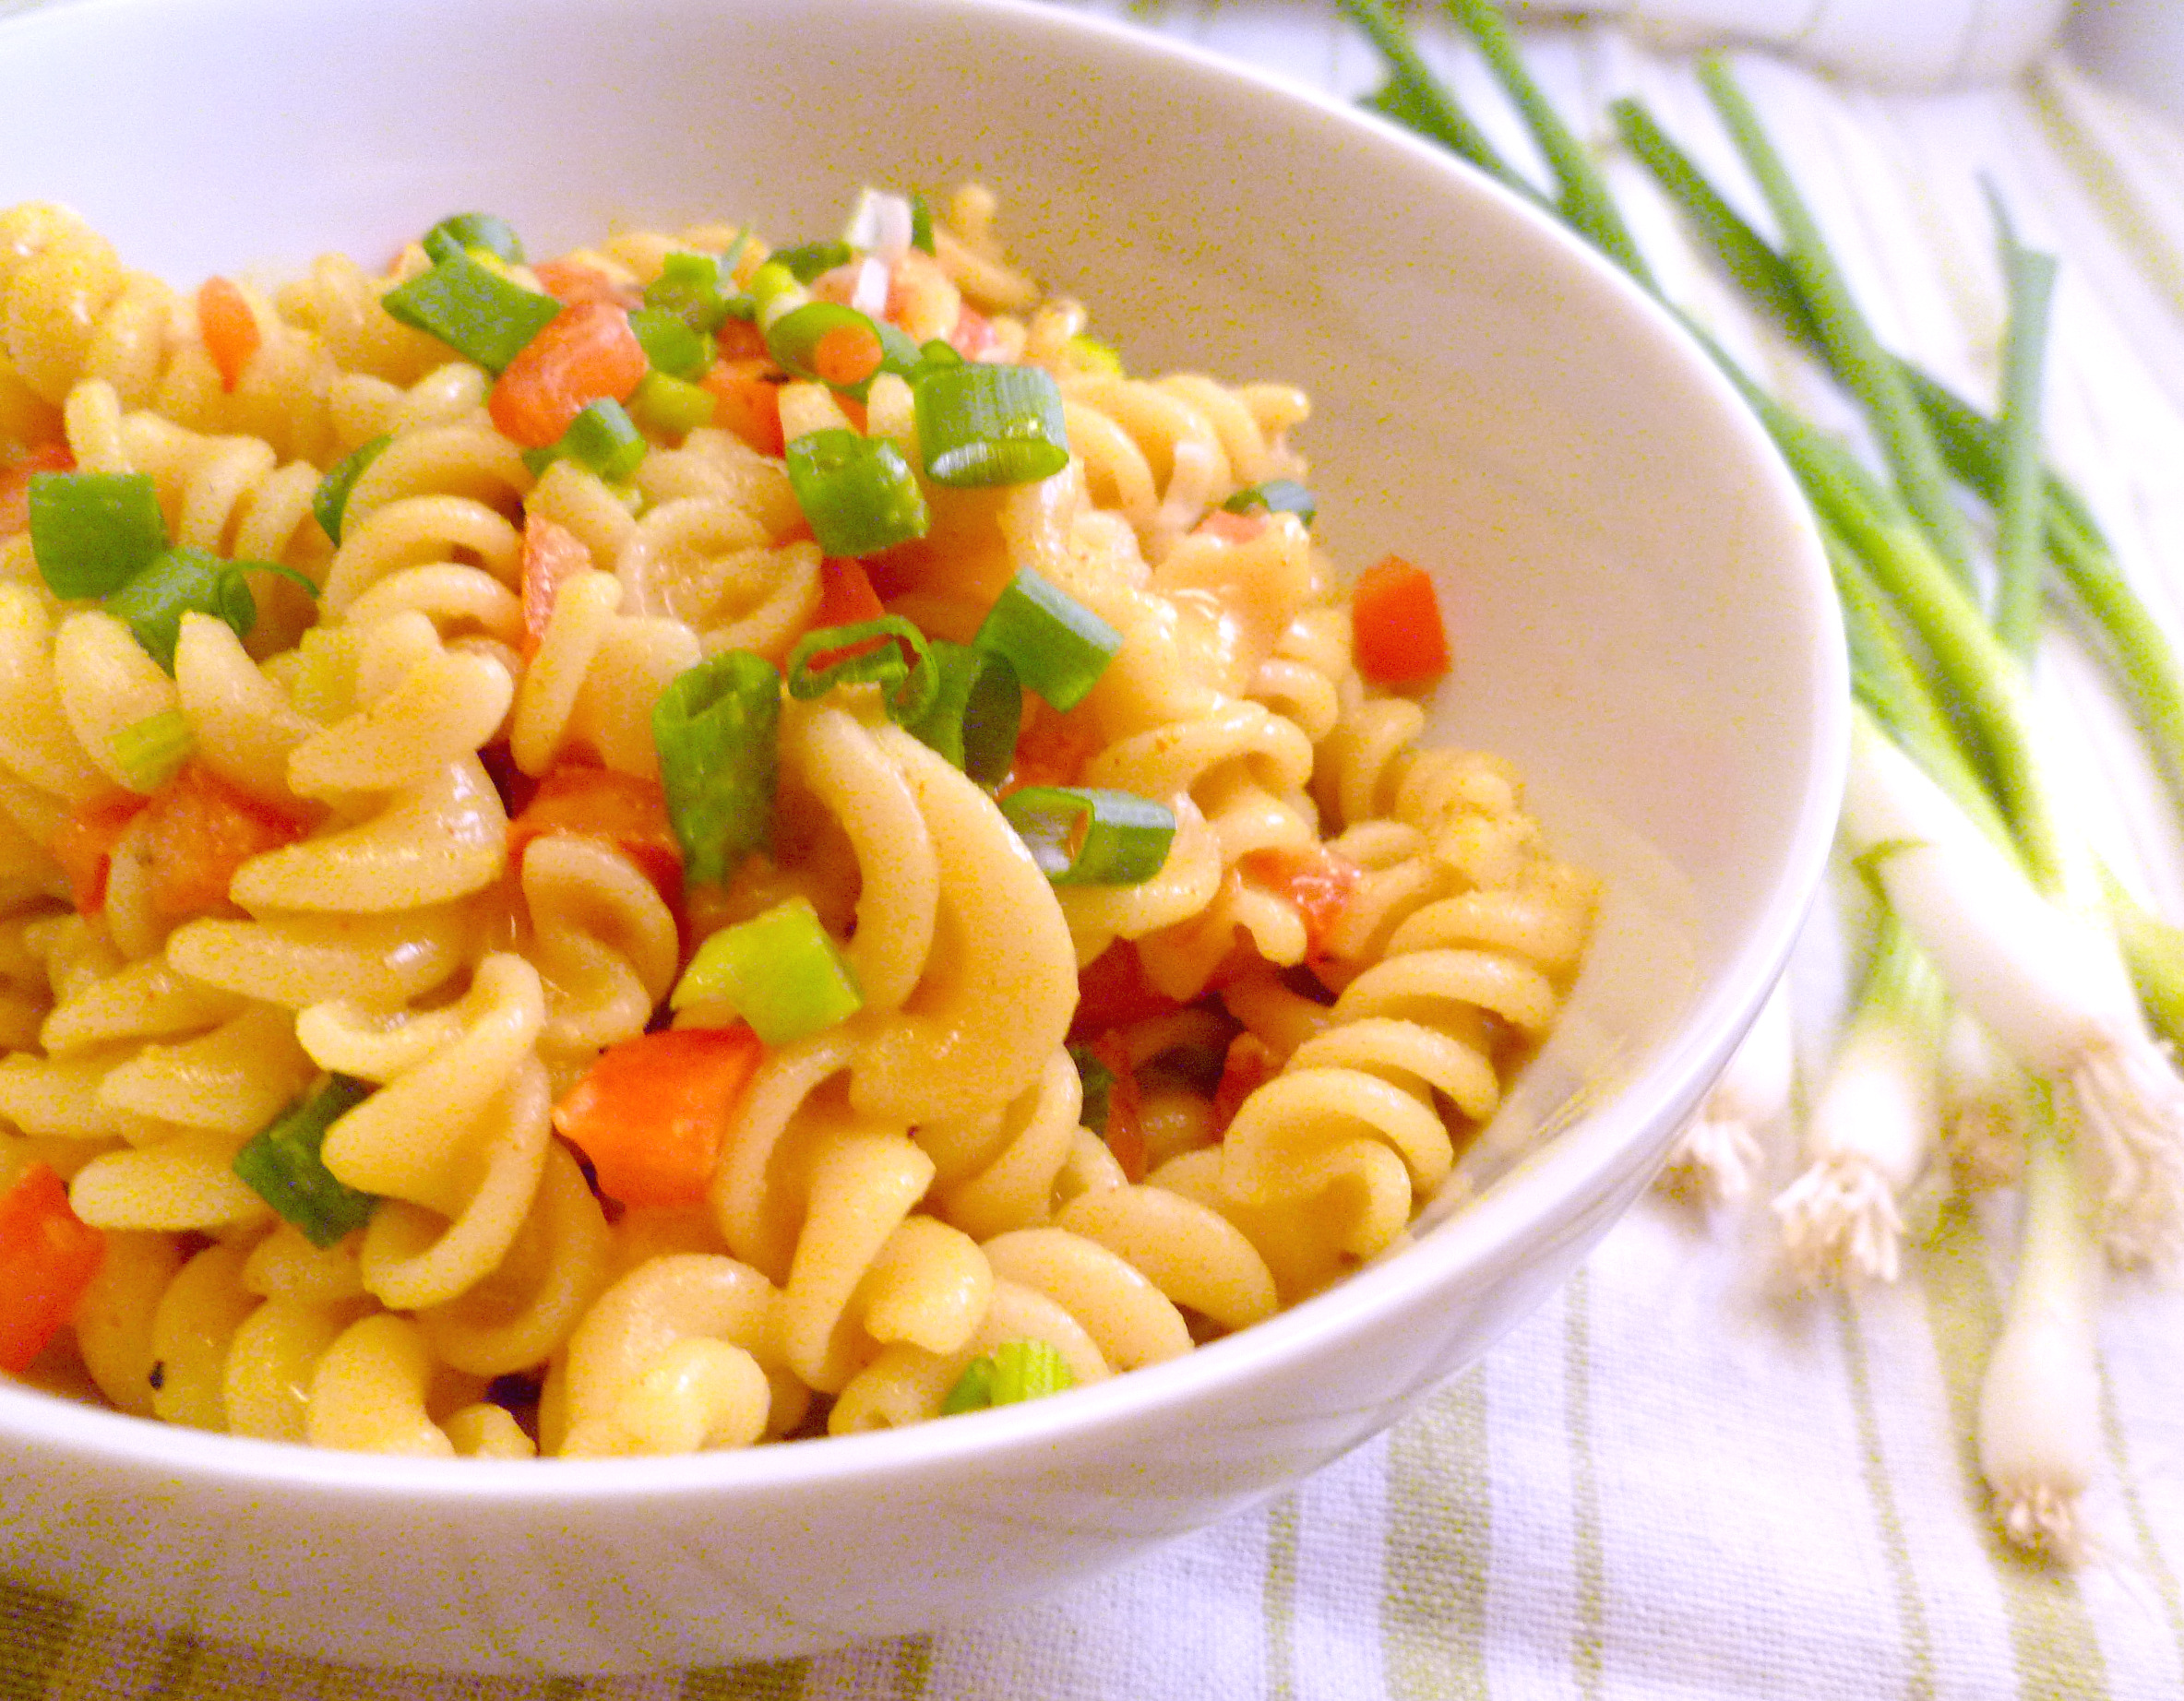 how to make vegeterian pasta sauce